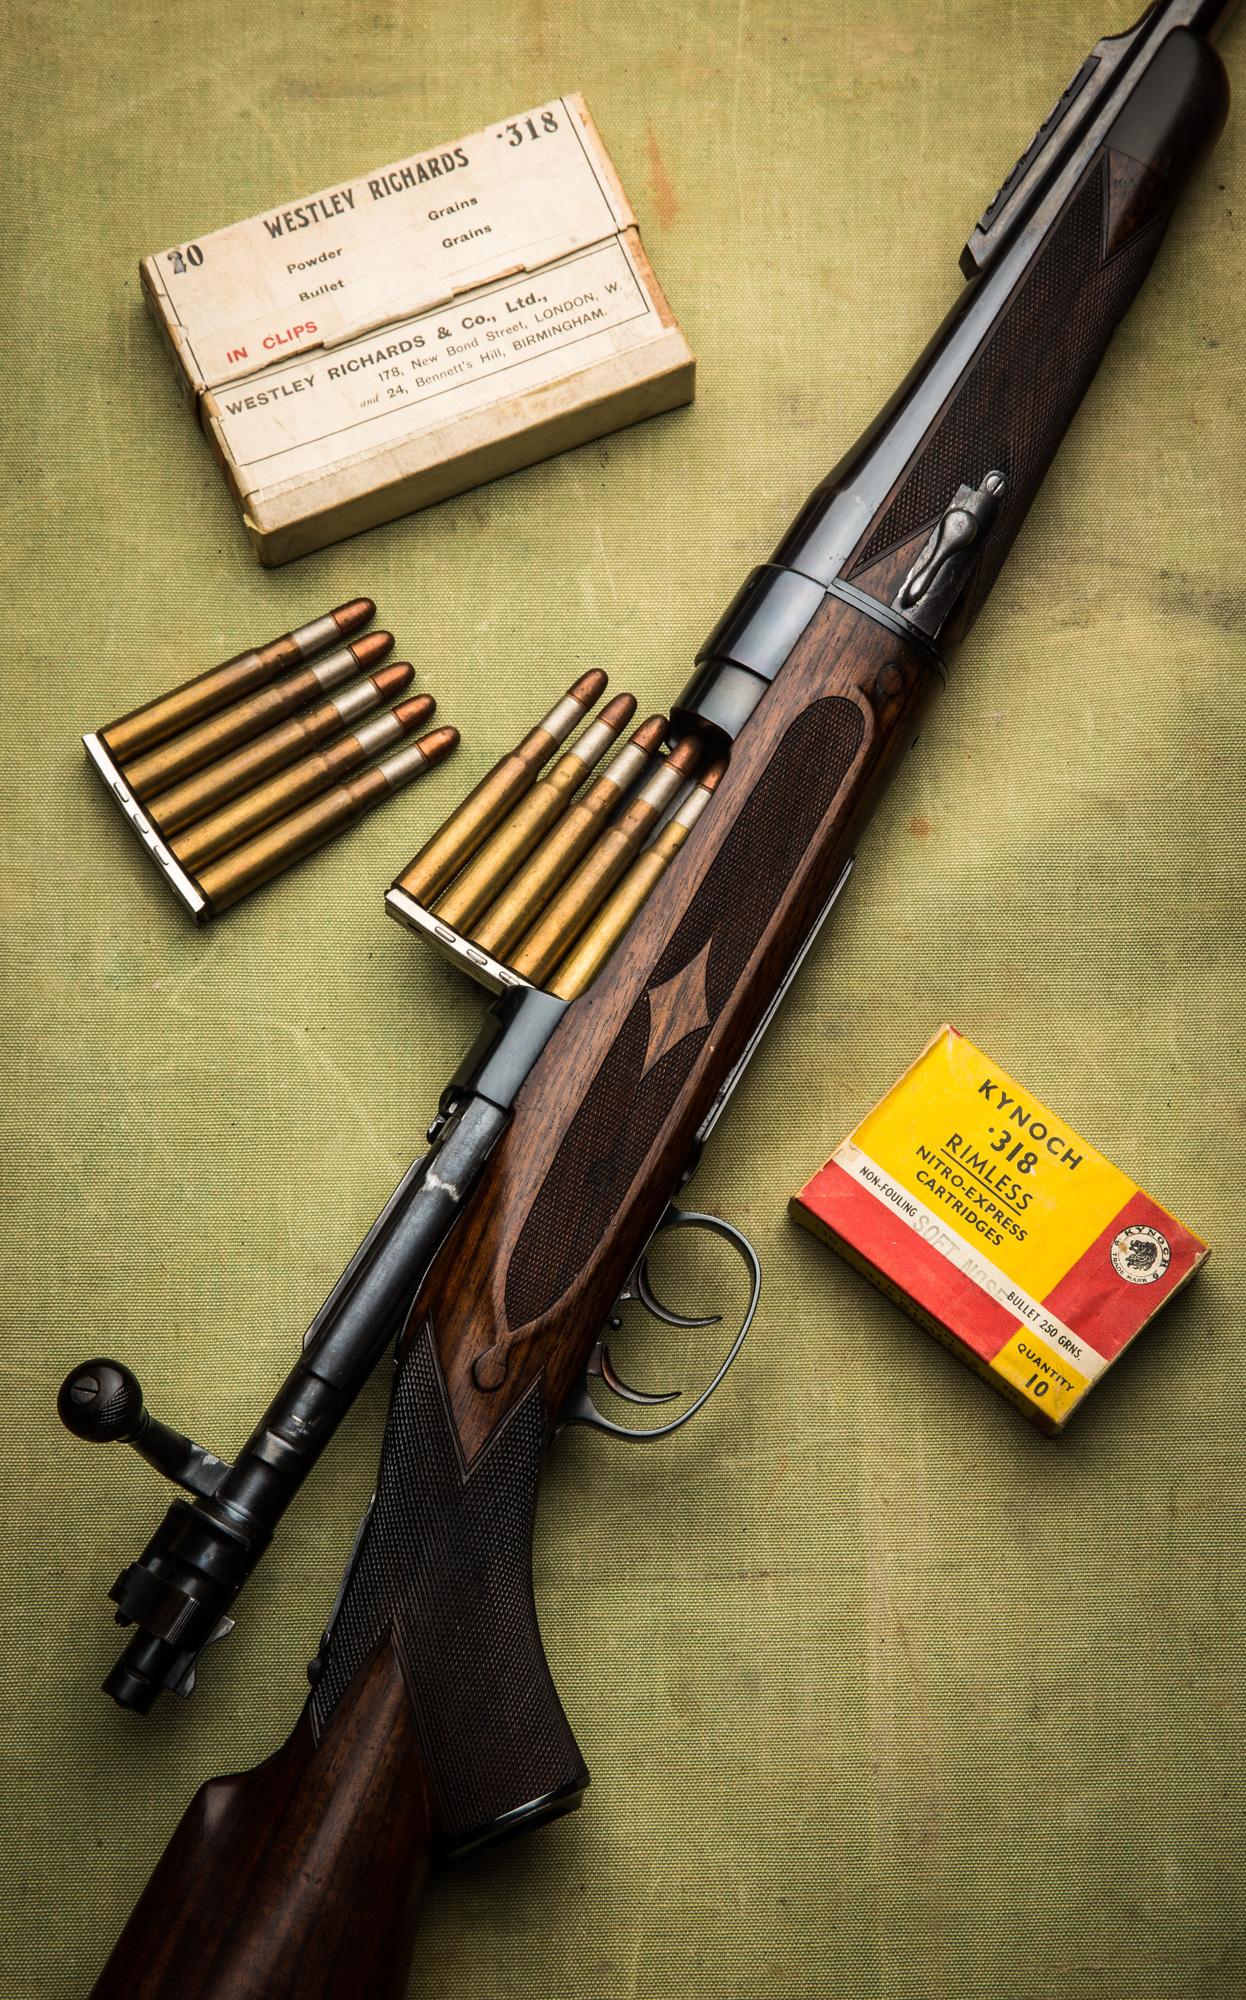 Westley Richards, Bolt action, 318, clip ammunition